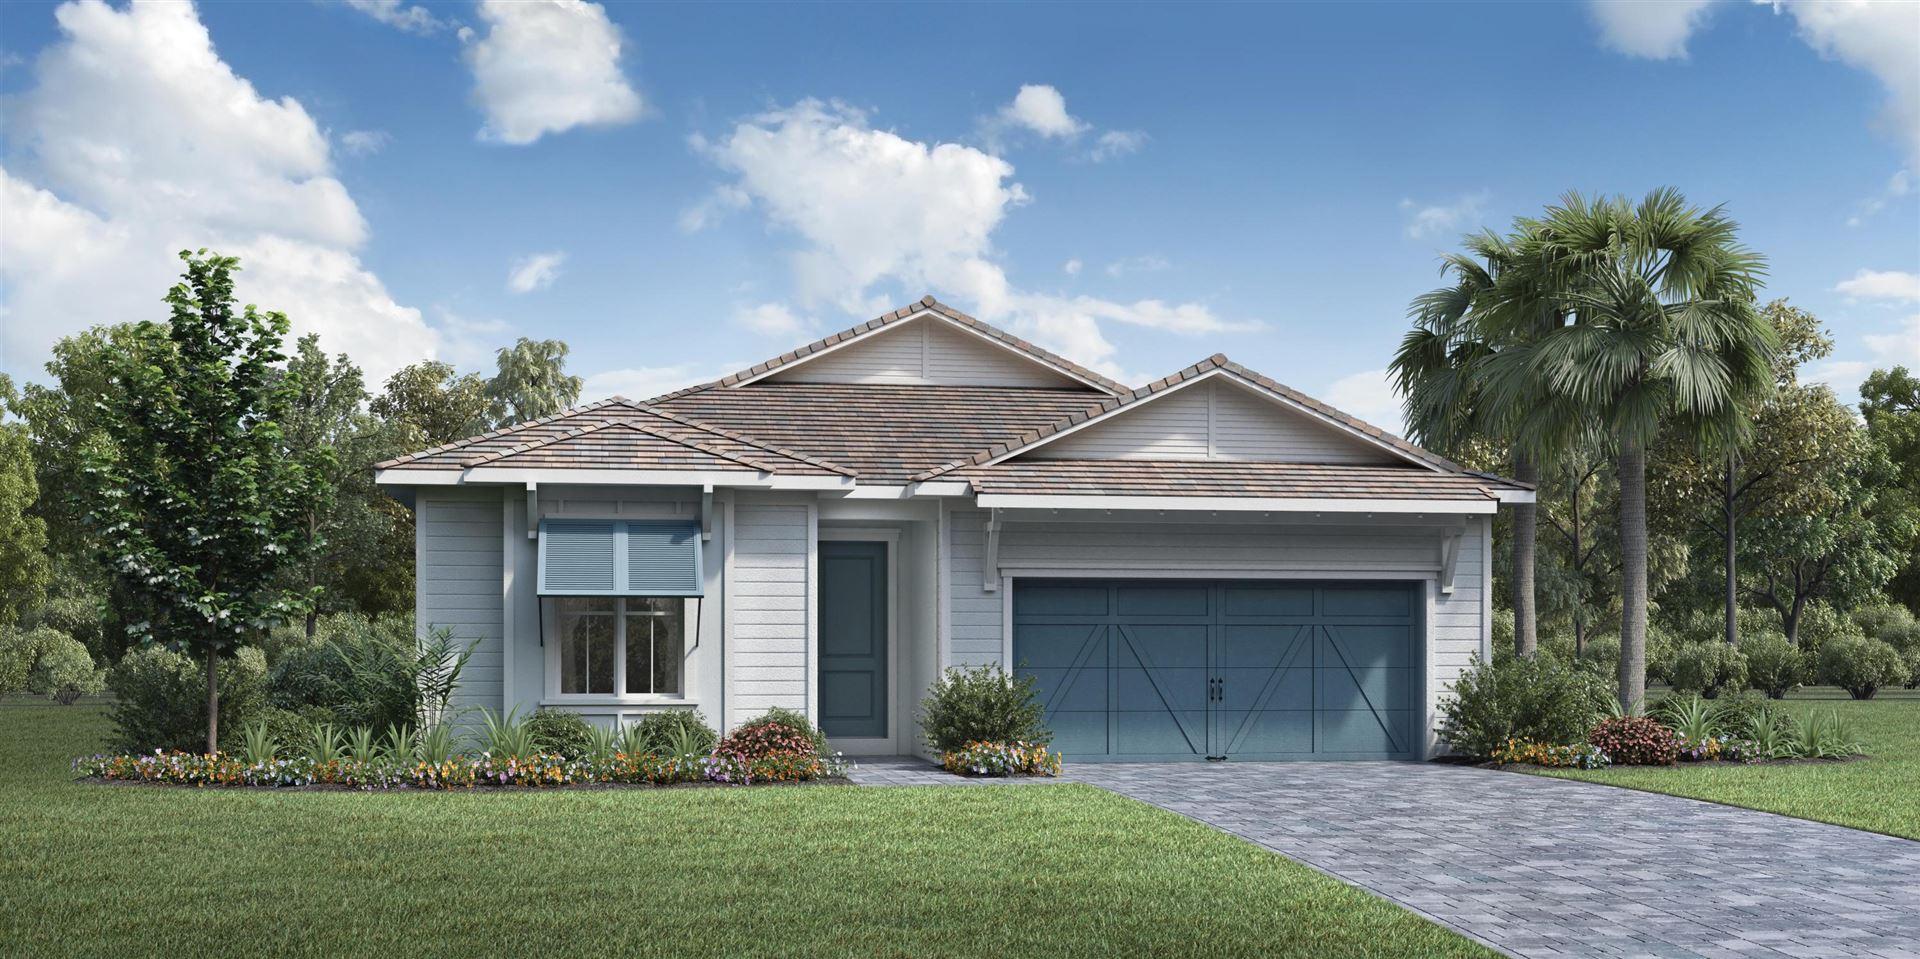 Photo of 12440 Nautilus Circle, Palm Beach Gardens, FL 33412 (MLS # RX-10647407)